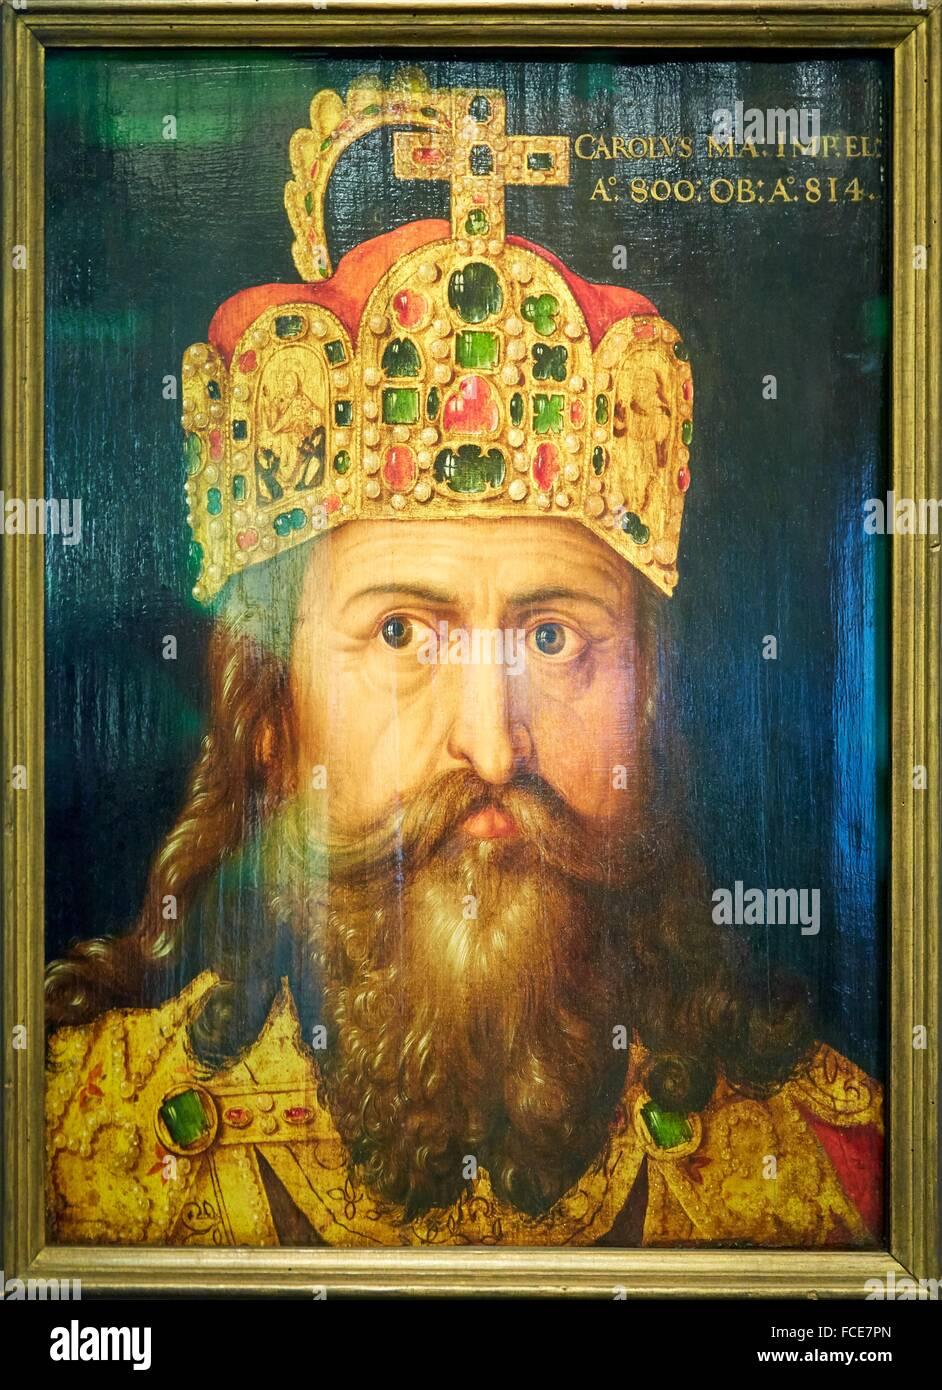 Portrait of Charlemagne, Deutsches Historisches Museum, Berlin, Germany - Stock Image